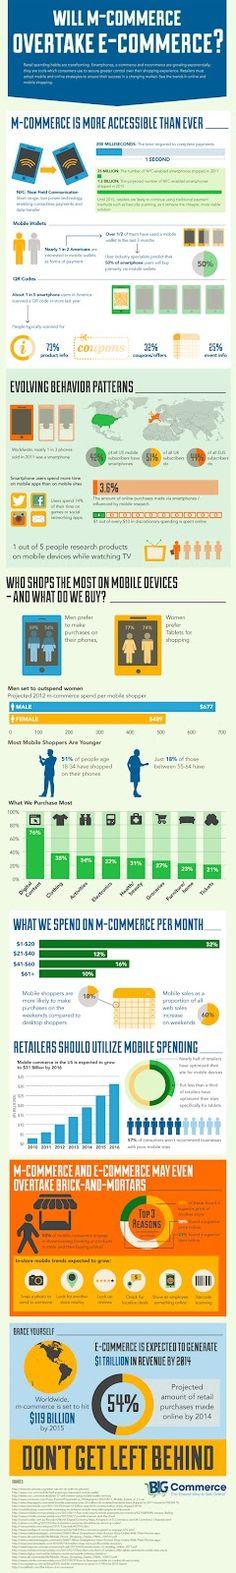 MobileMarketing.nl: Mobile Infographics (2 augustus 2012)